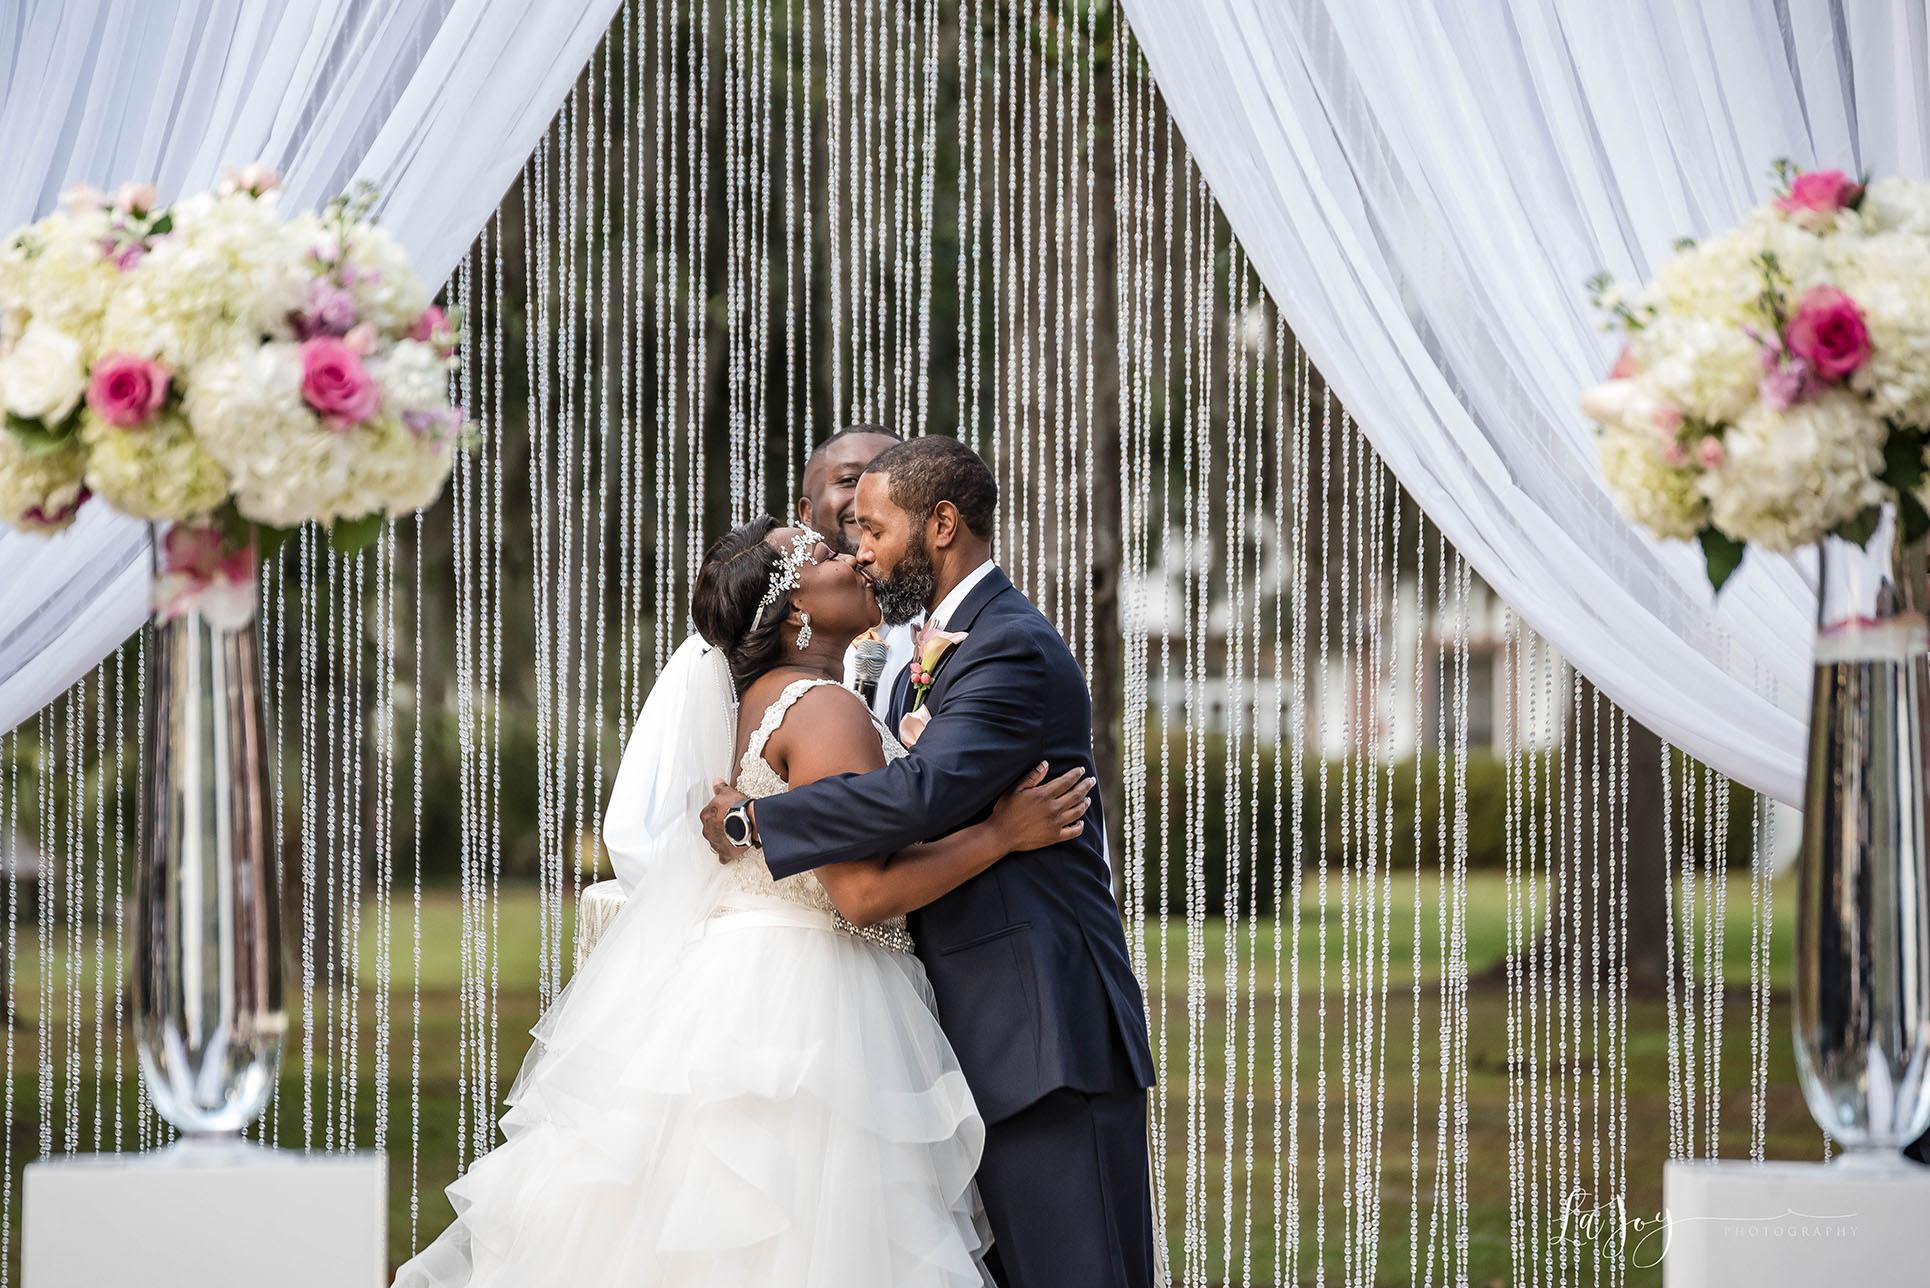 Frankie Leland Events Luxury Wedding Planner Tallahassee.jpg